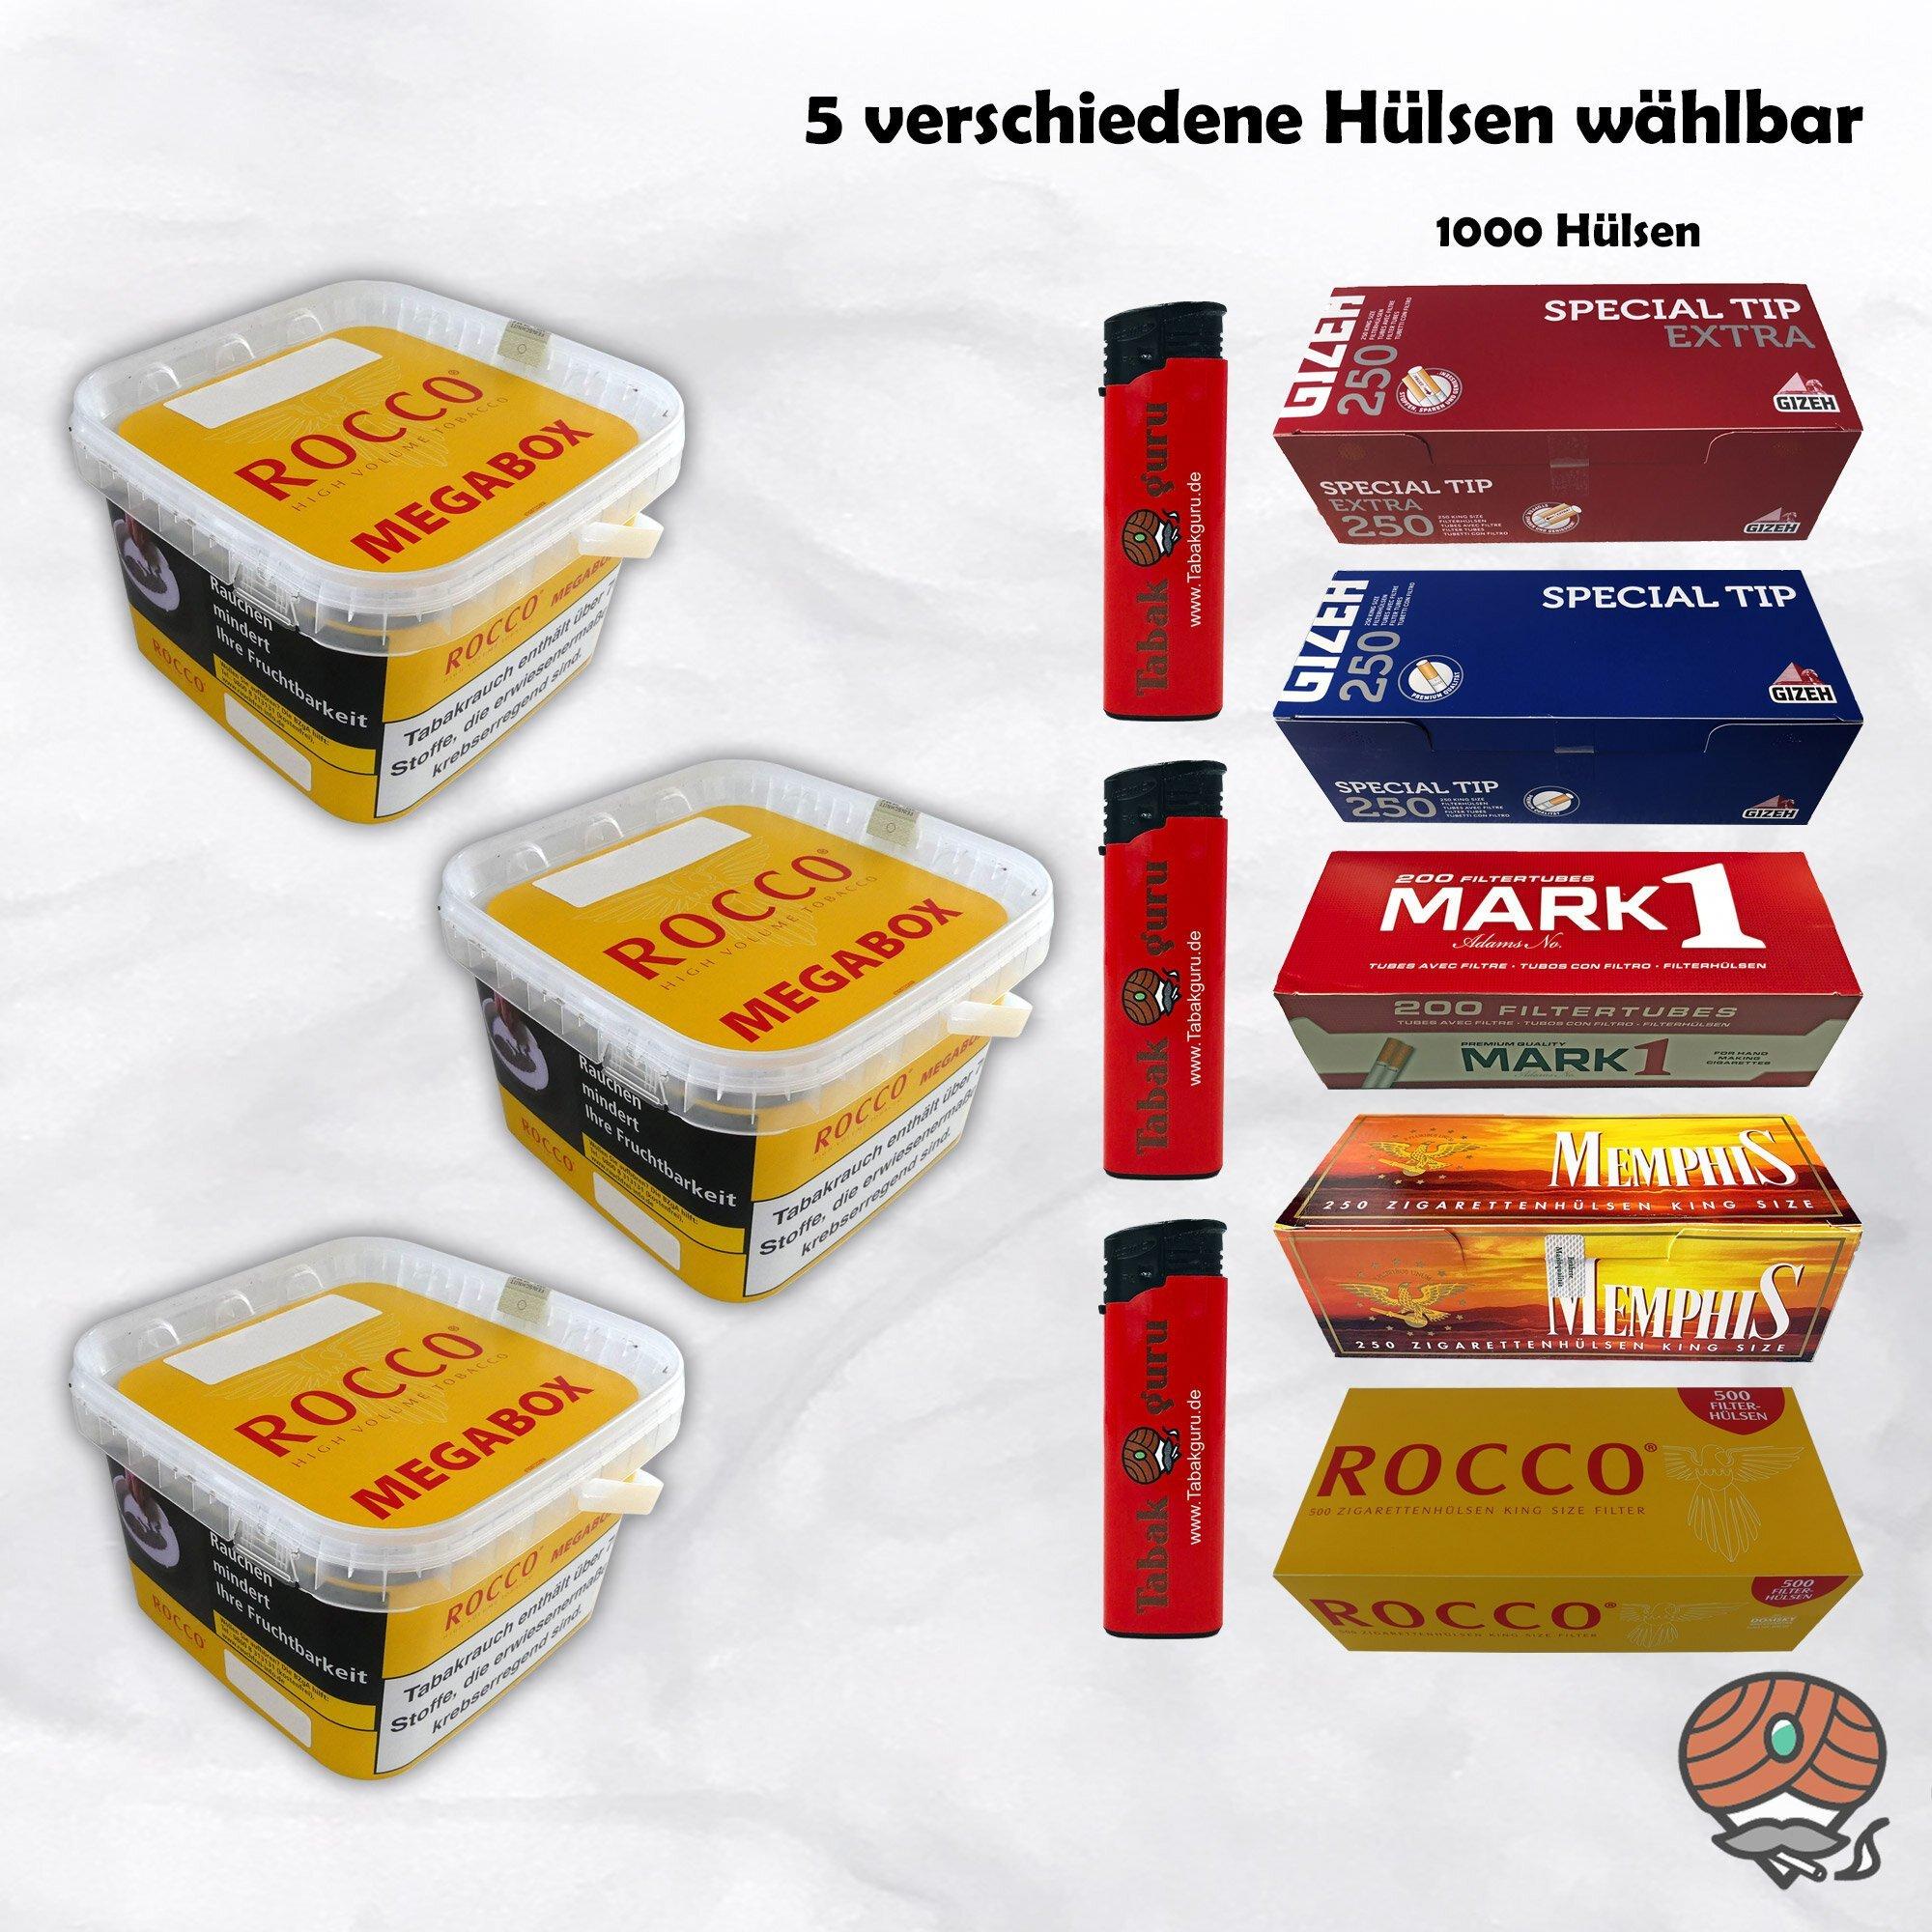 3 x ROCCO Volumentabak Gelb Megabox 210 g + 1.000 Hülsen wählbar